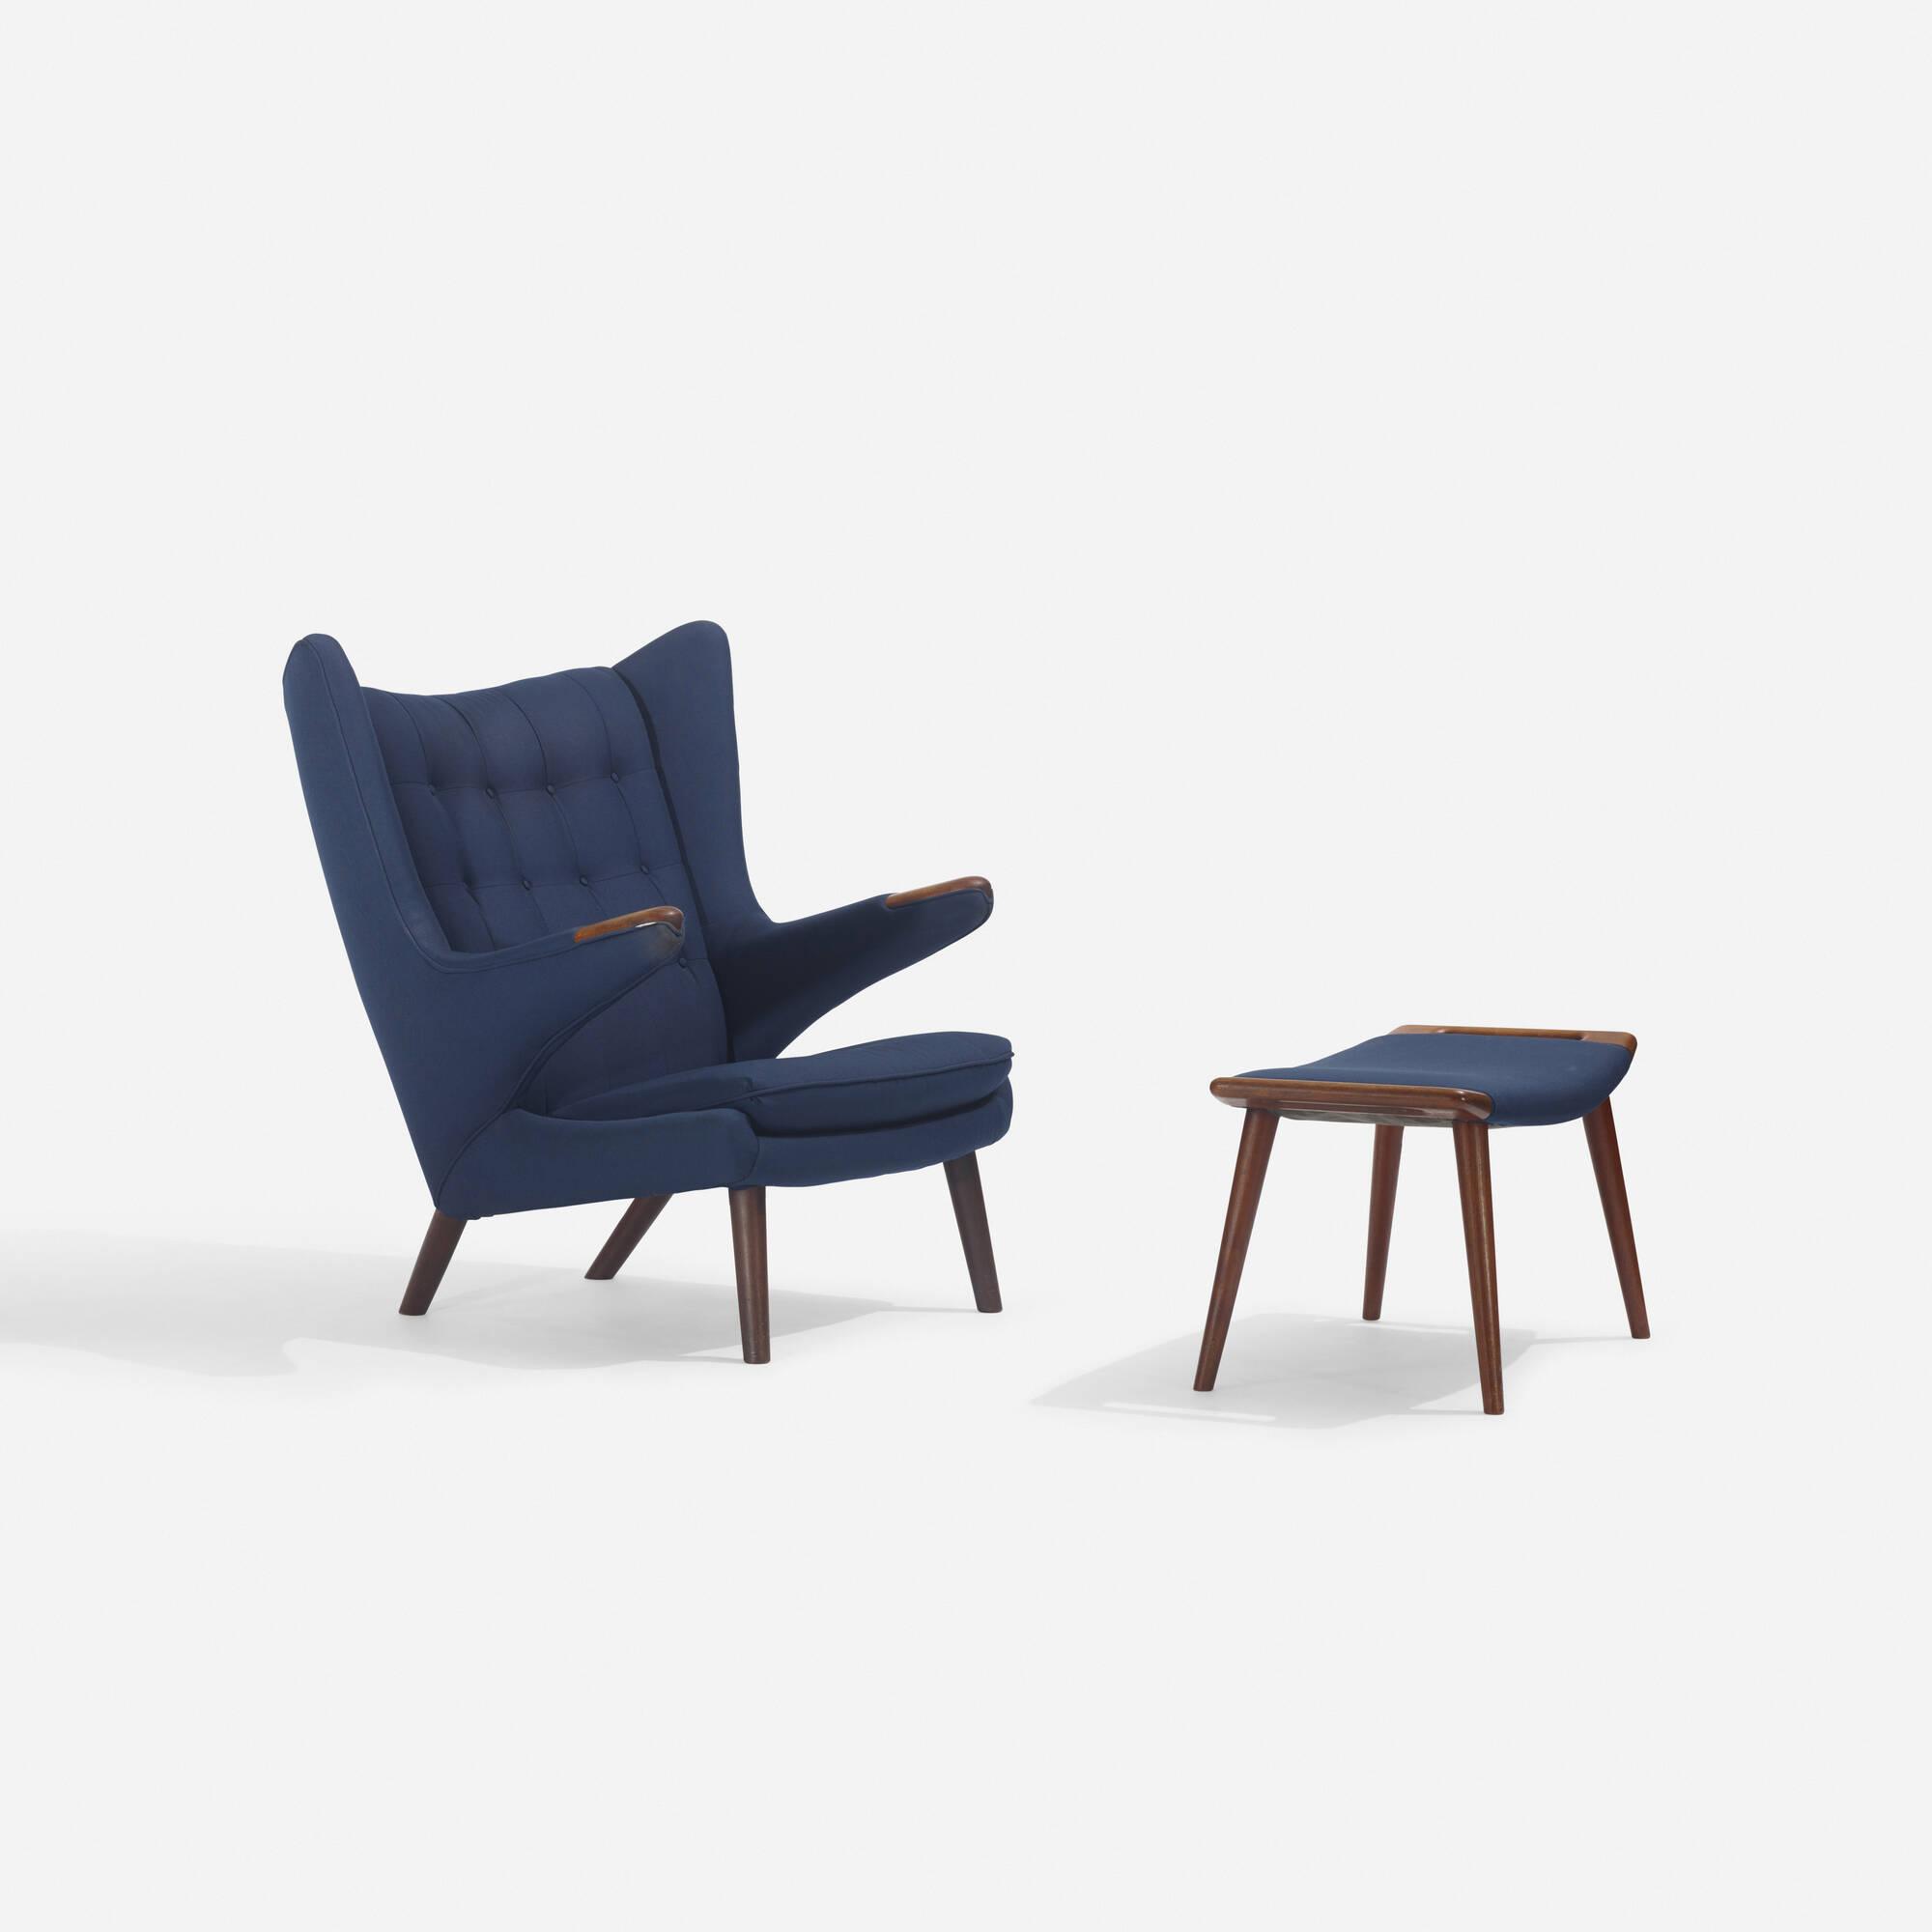 132: Hans J. Wegner / Papa Bear chair and ottoman (2 of 3)